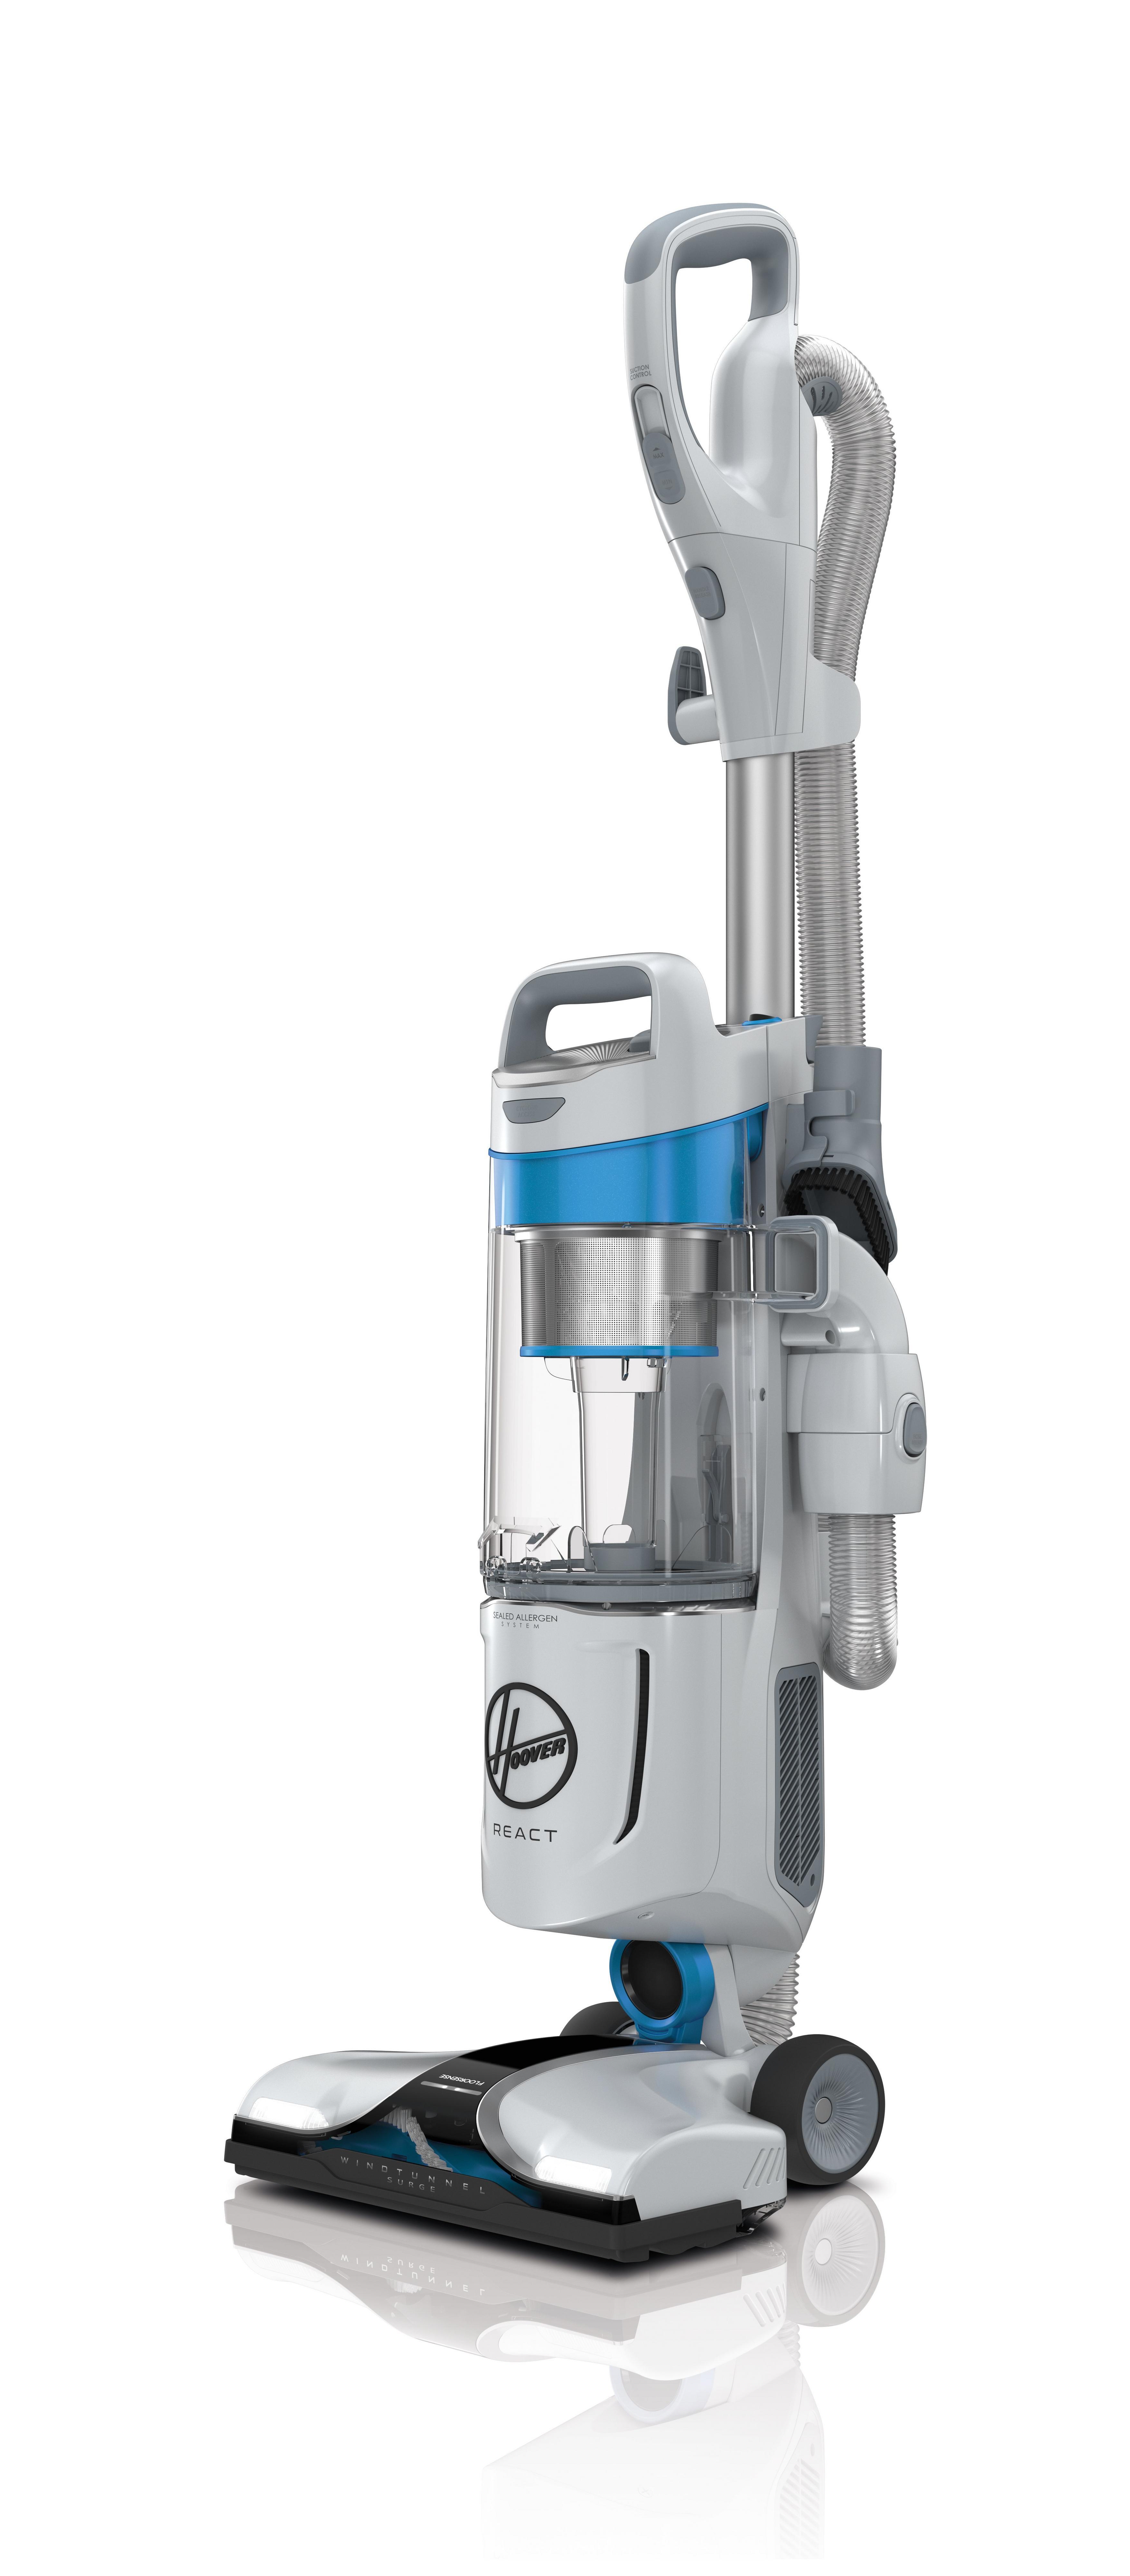 REACT Upright Vacuum13